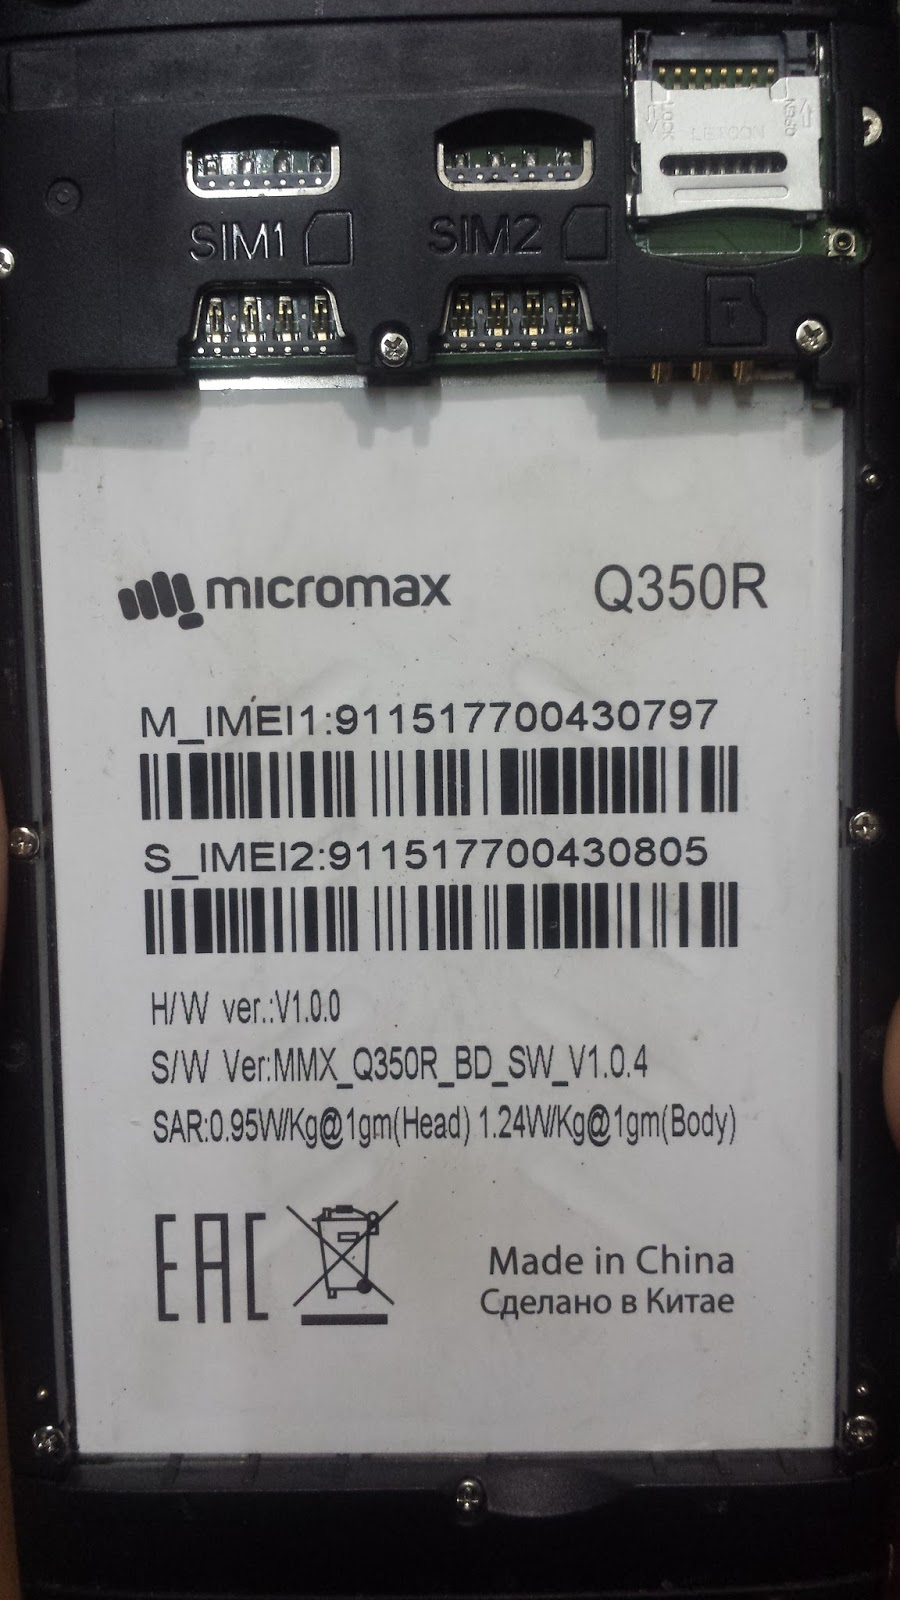 FLASH FILE KING: MICROMAX Q350R V1 0 0 SW V1 0 4 FLASH FILE